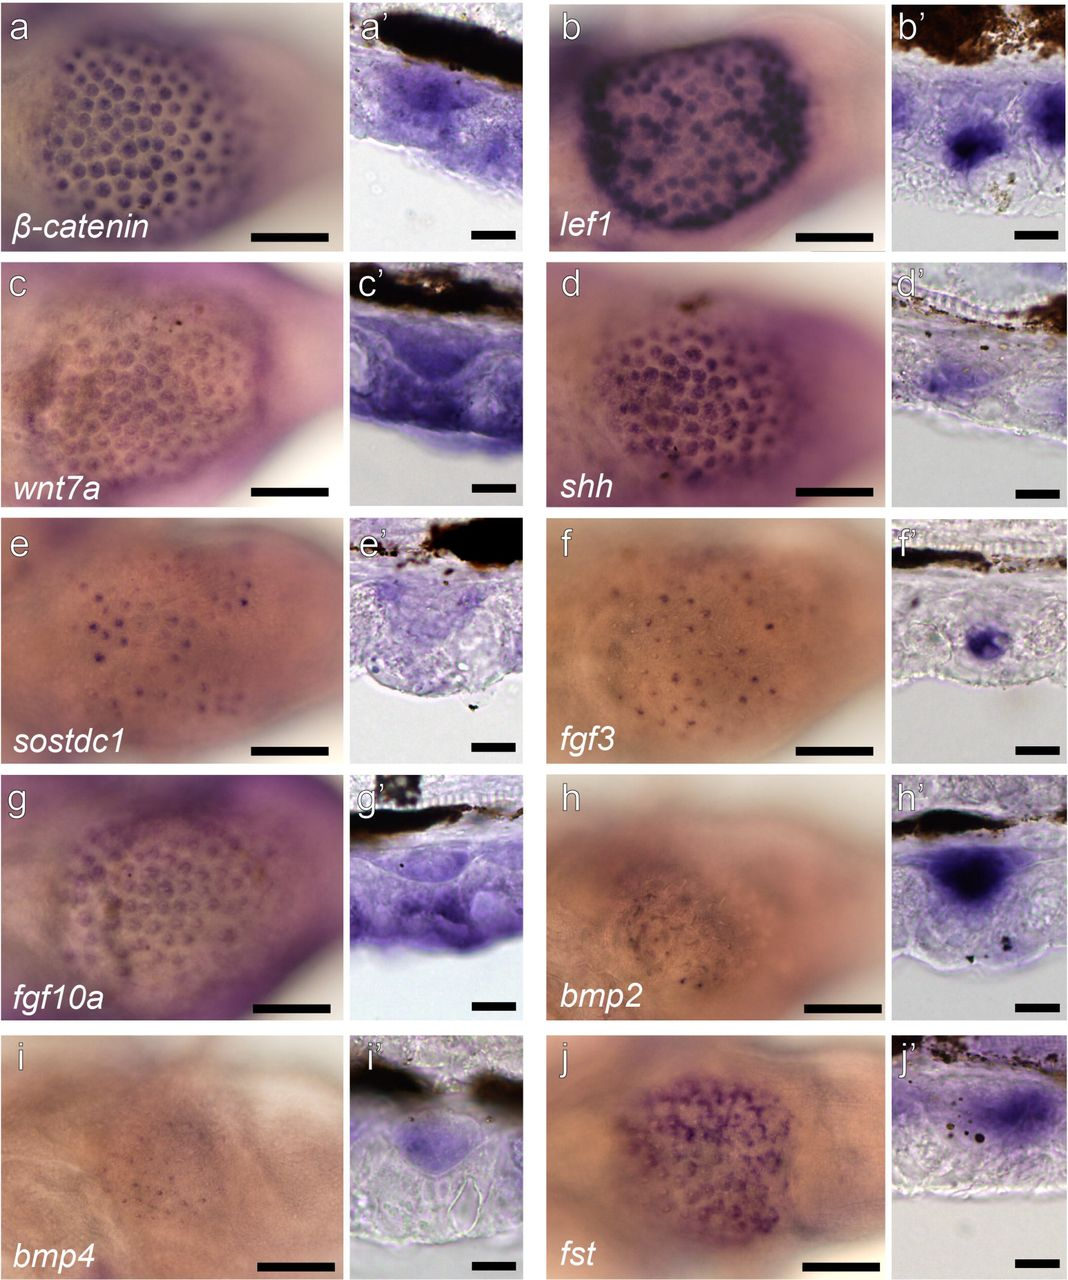 Evolution and developmental diversity of skin spines in